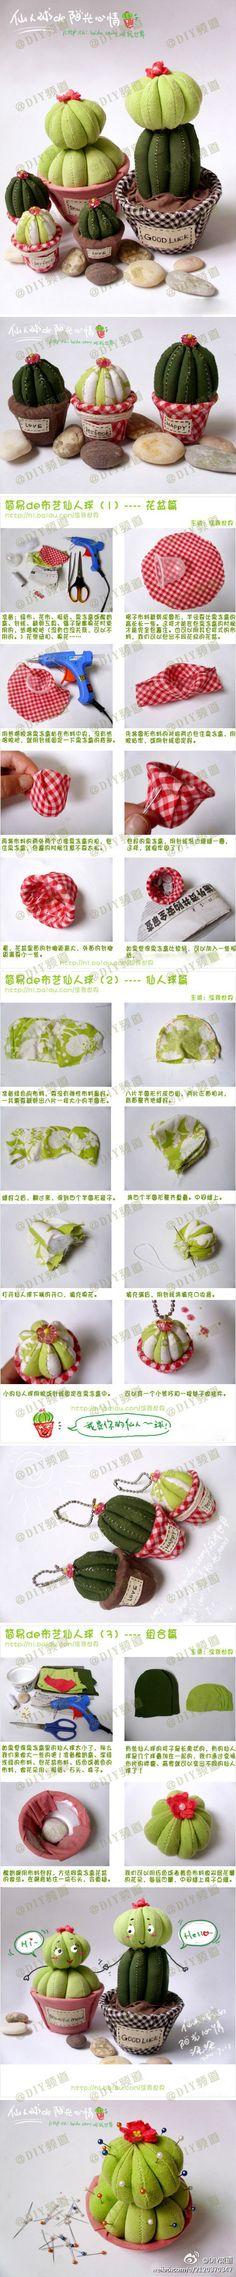 Cactus Pincushions • tutorial information shown in image.